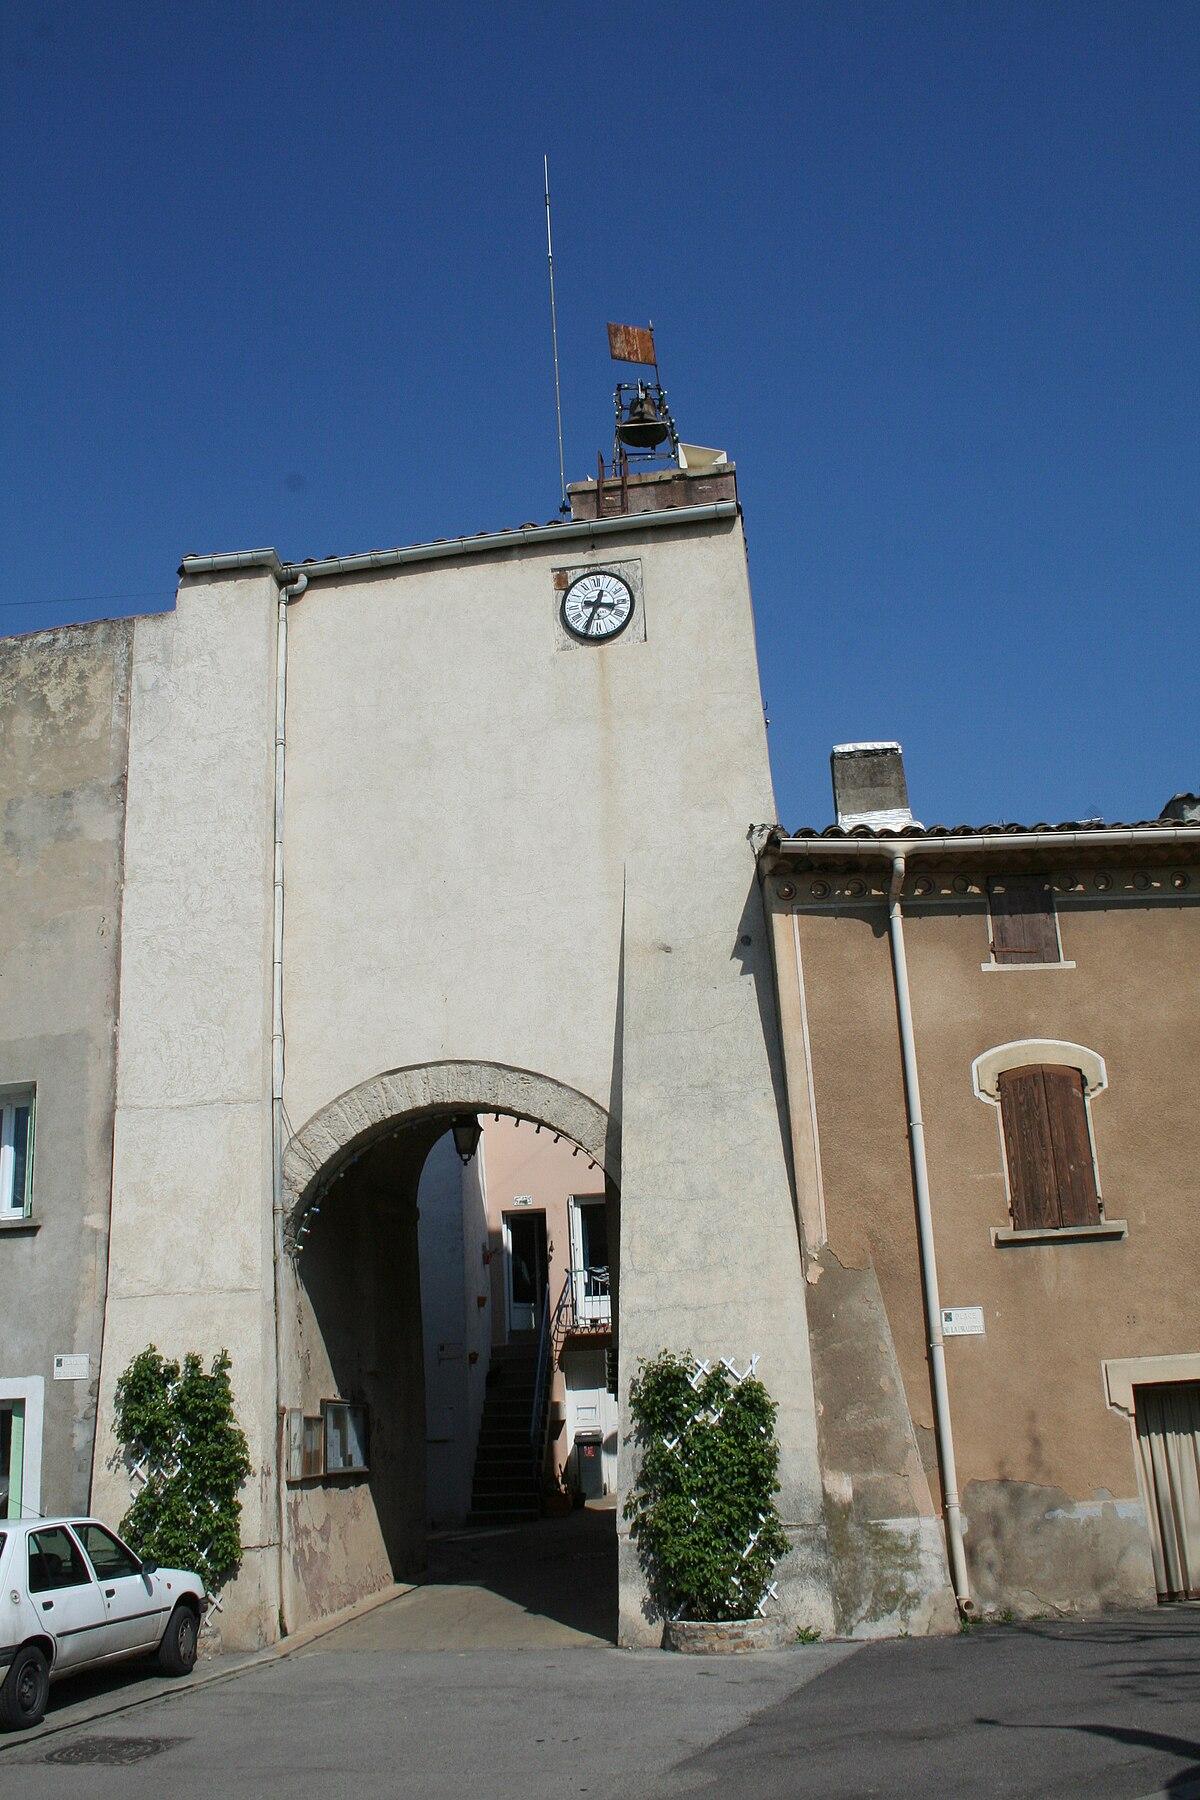 Saint bauzille de la sylve wikidata for La porte in time zone